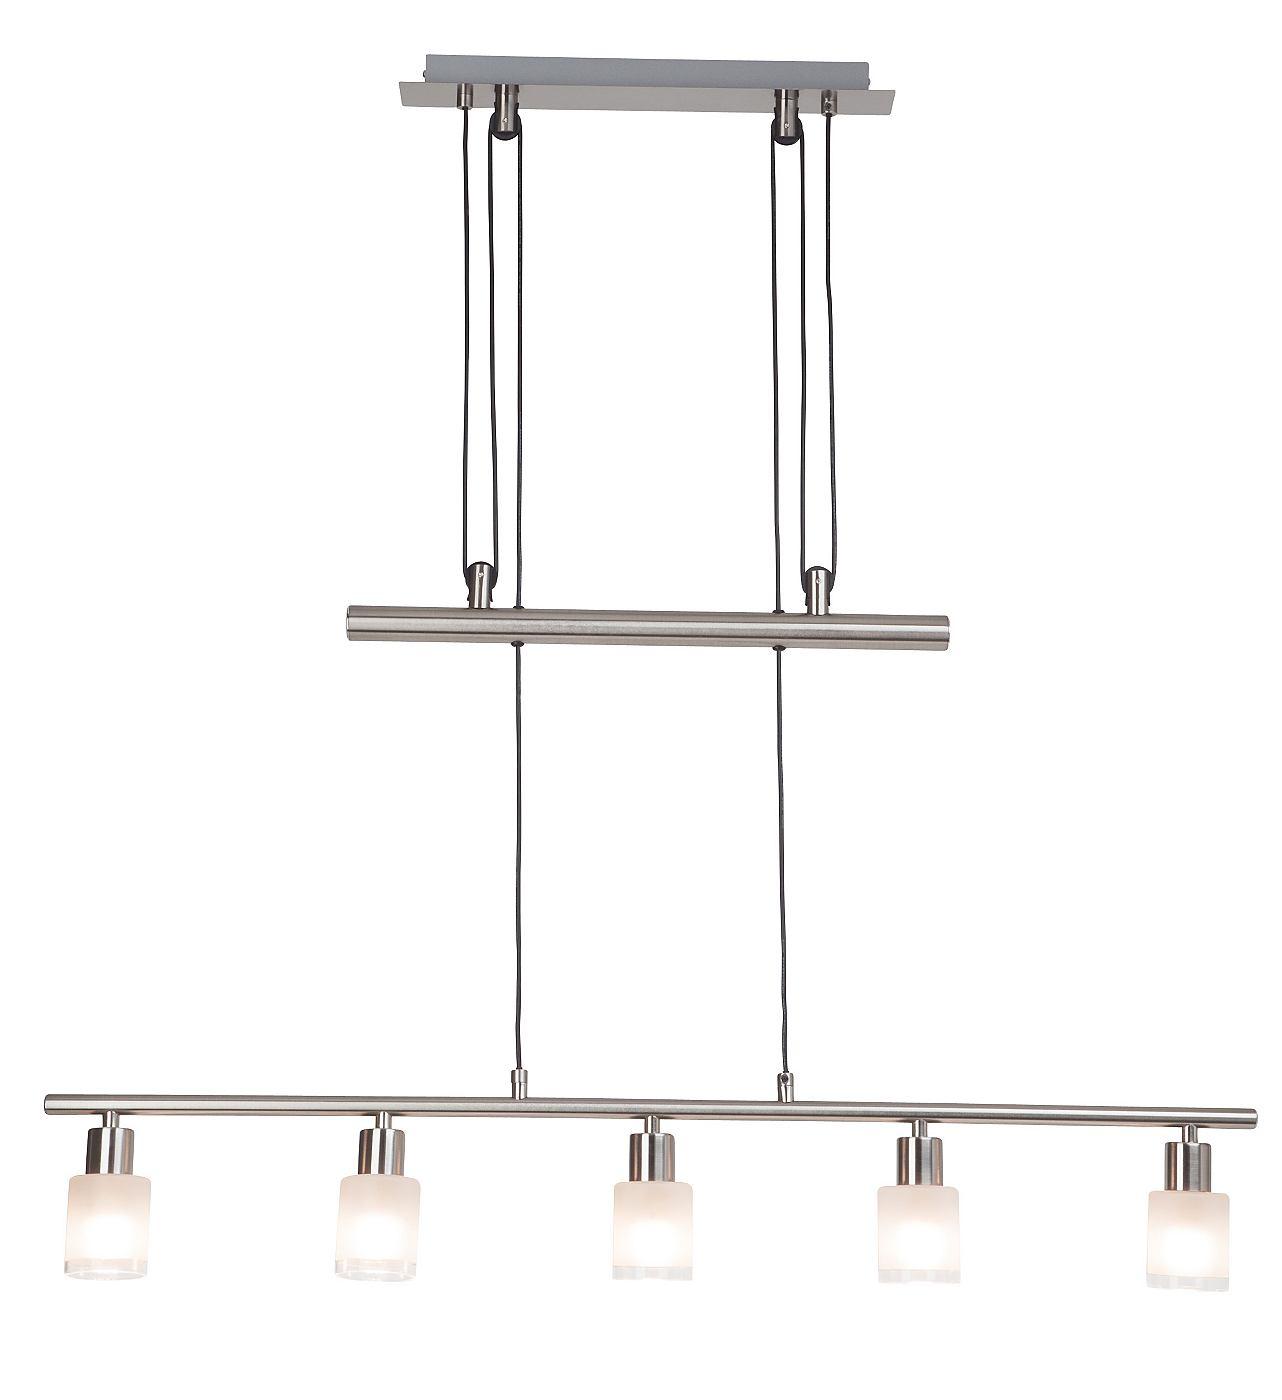 BRILLIANT Hanglamp incl. LED-lampen